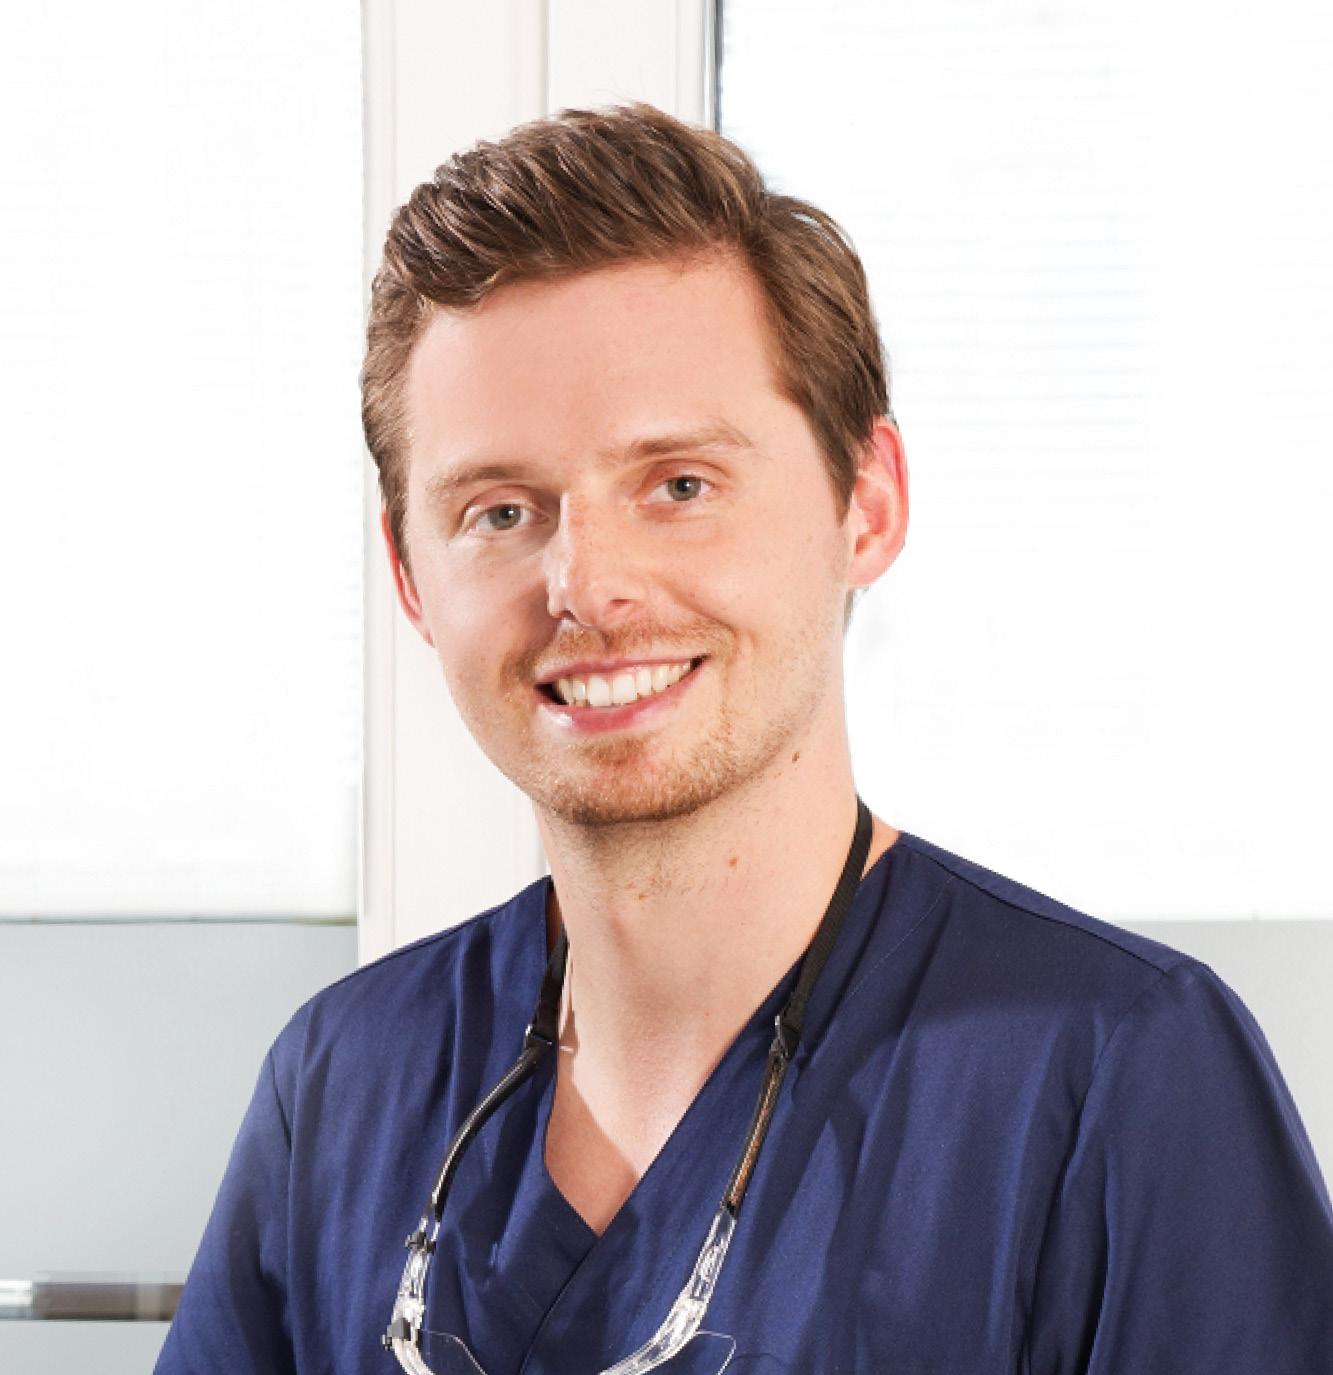 DR. TOBIAS SANDMANN